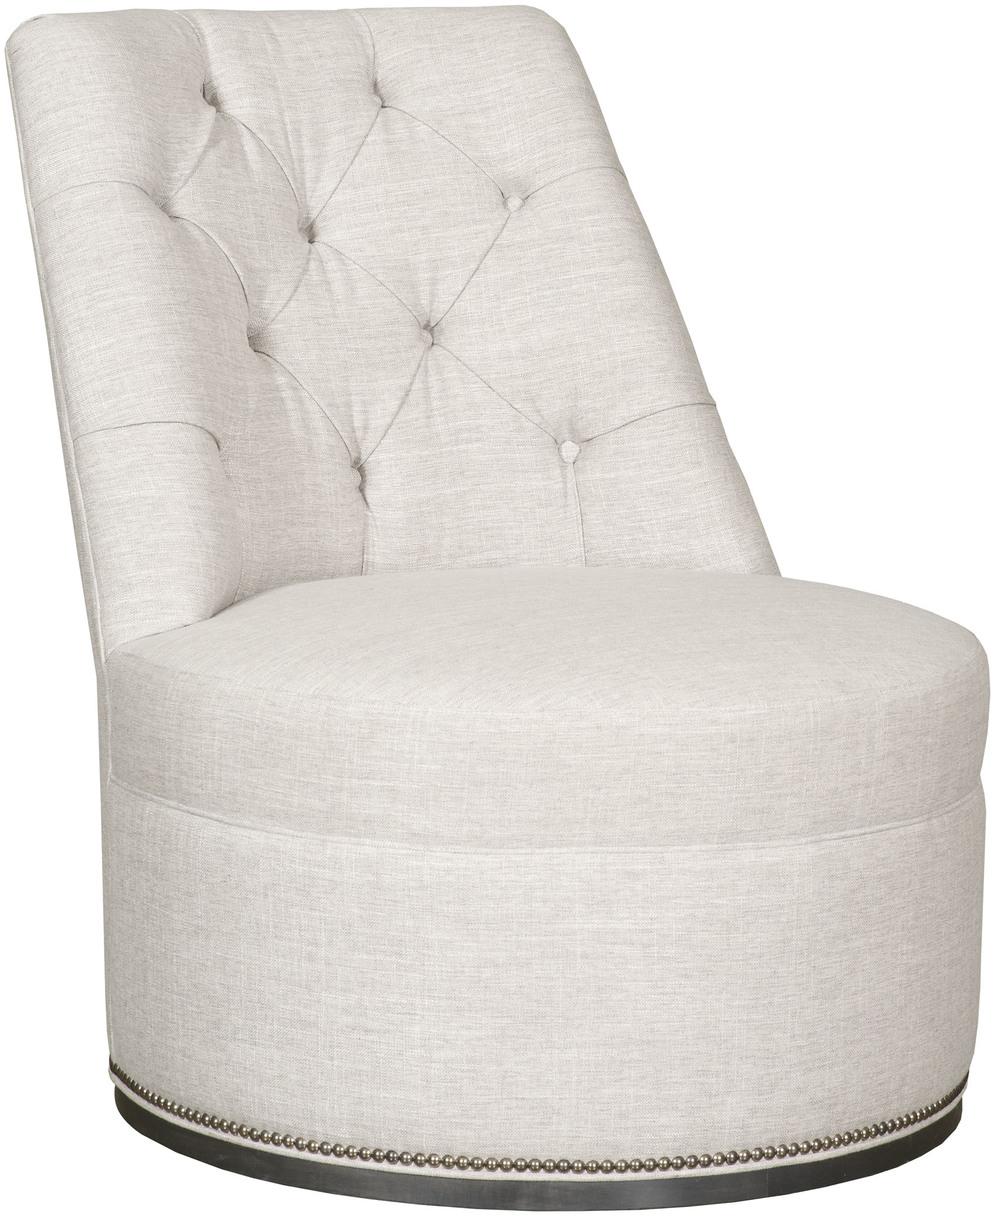 Vanguard Furniture - Malloy Swivel Chair